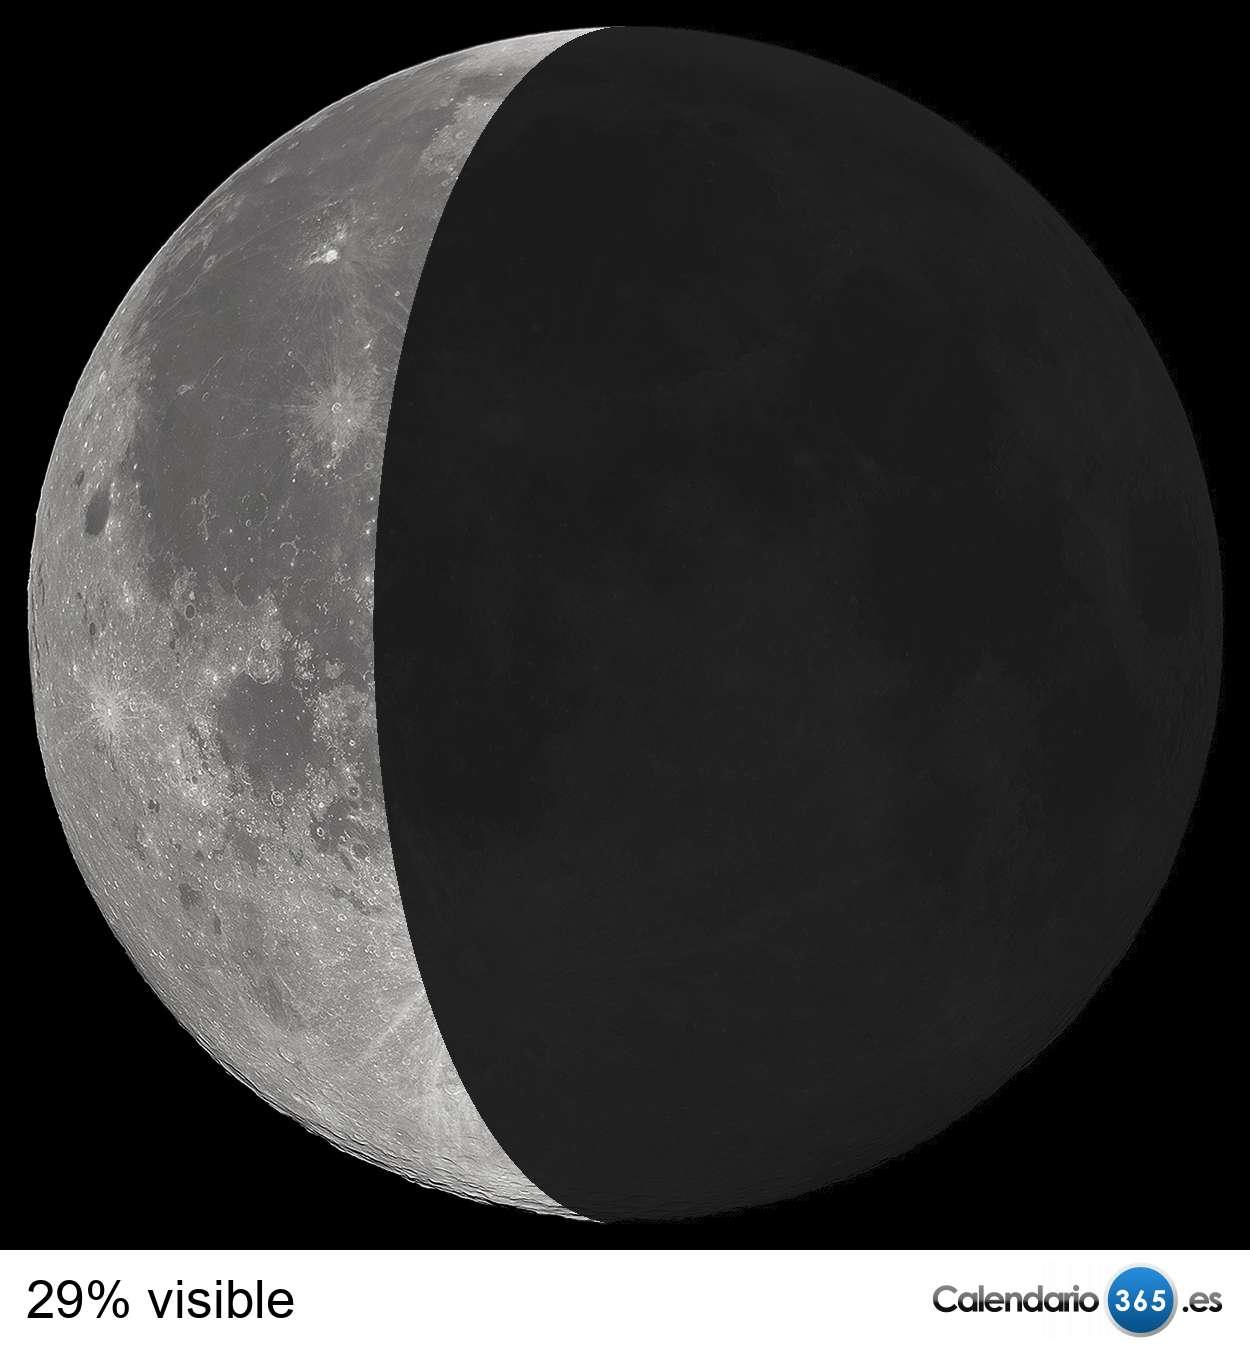 Fases de la luna 2020 & 2021